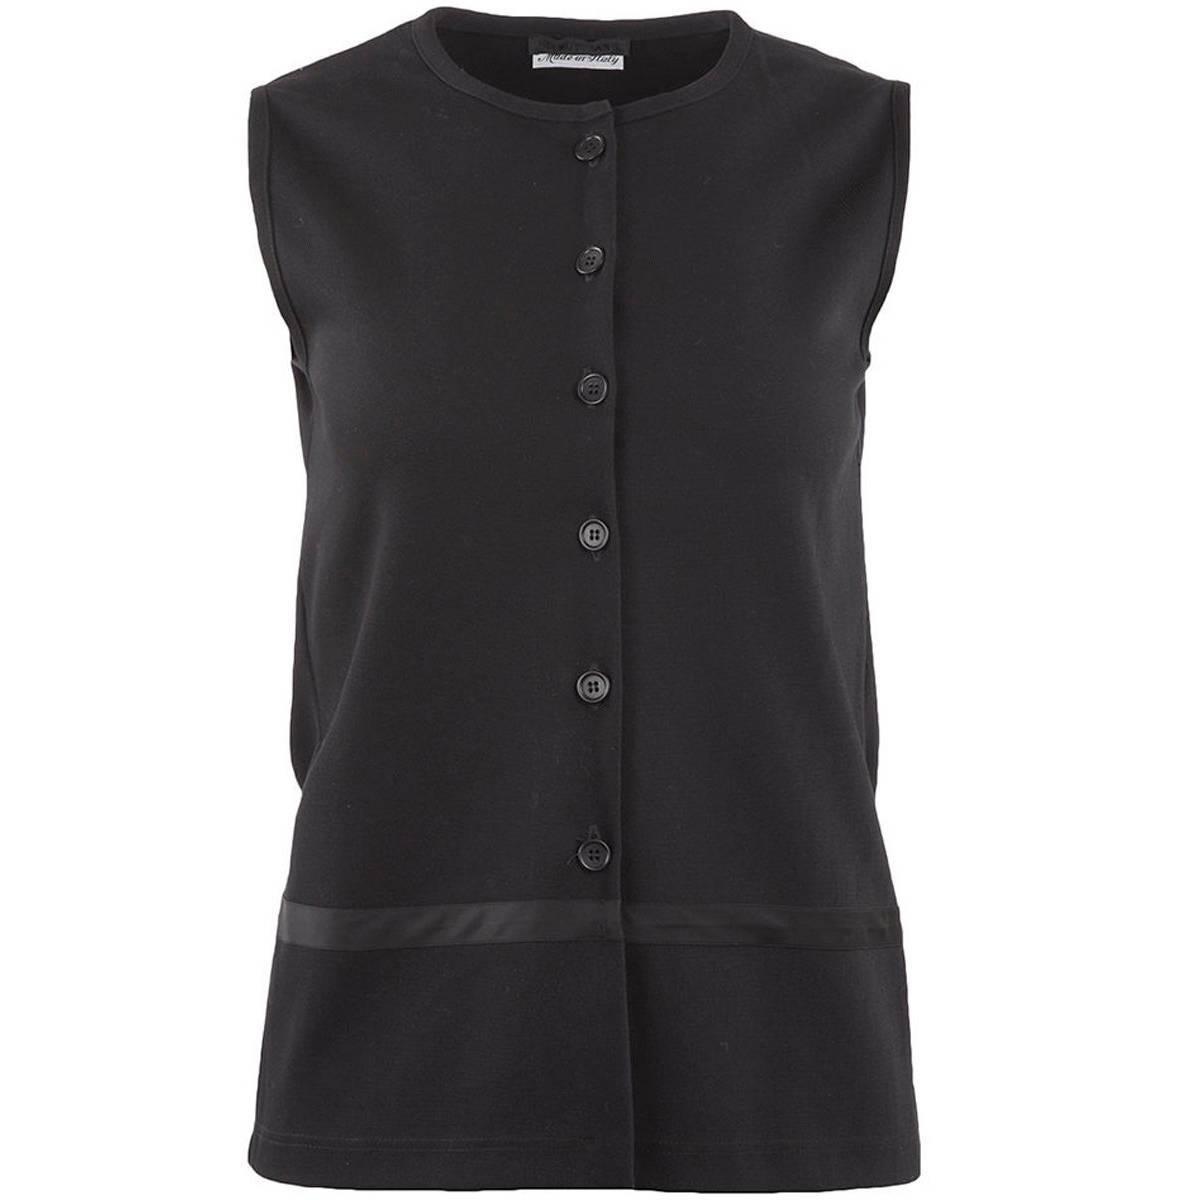 1990's Helmut Lang Minimal Black Buttoned Vest